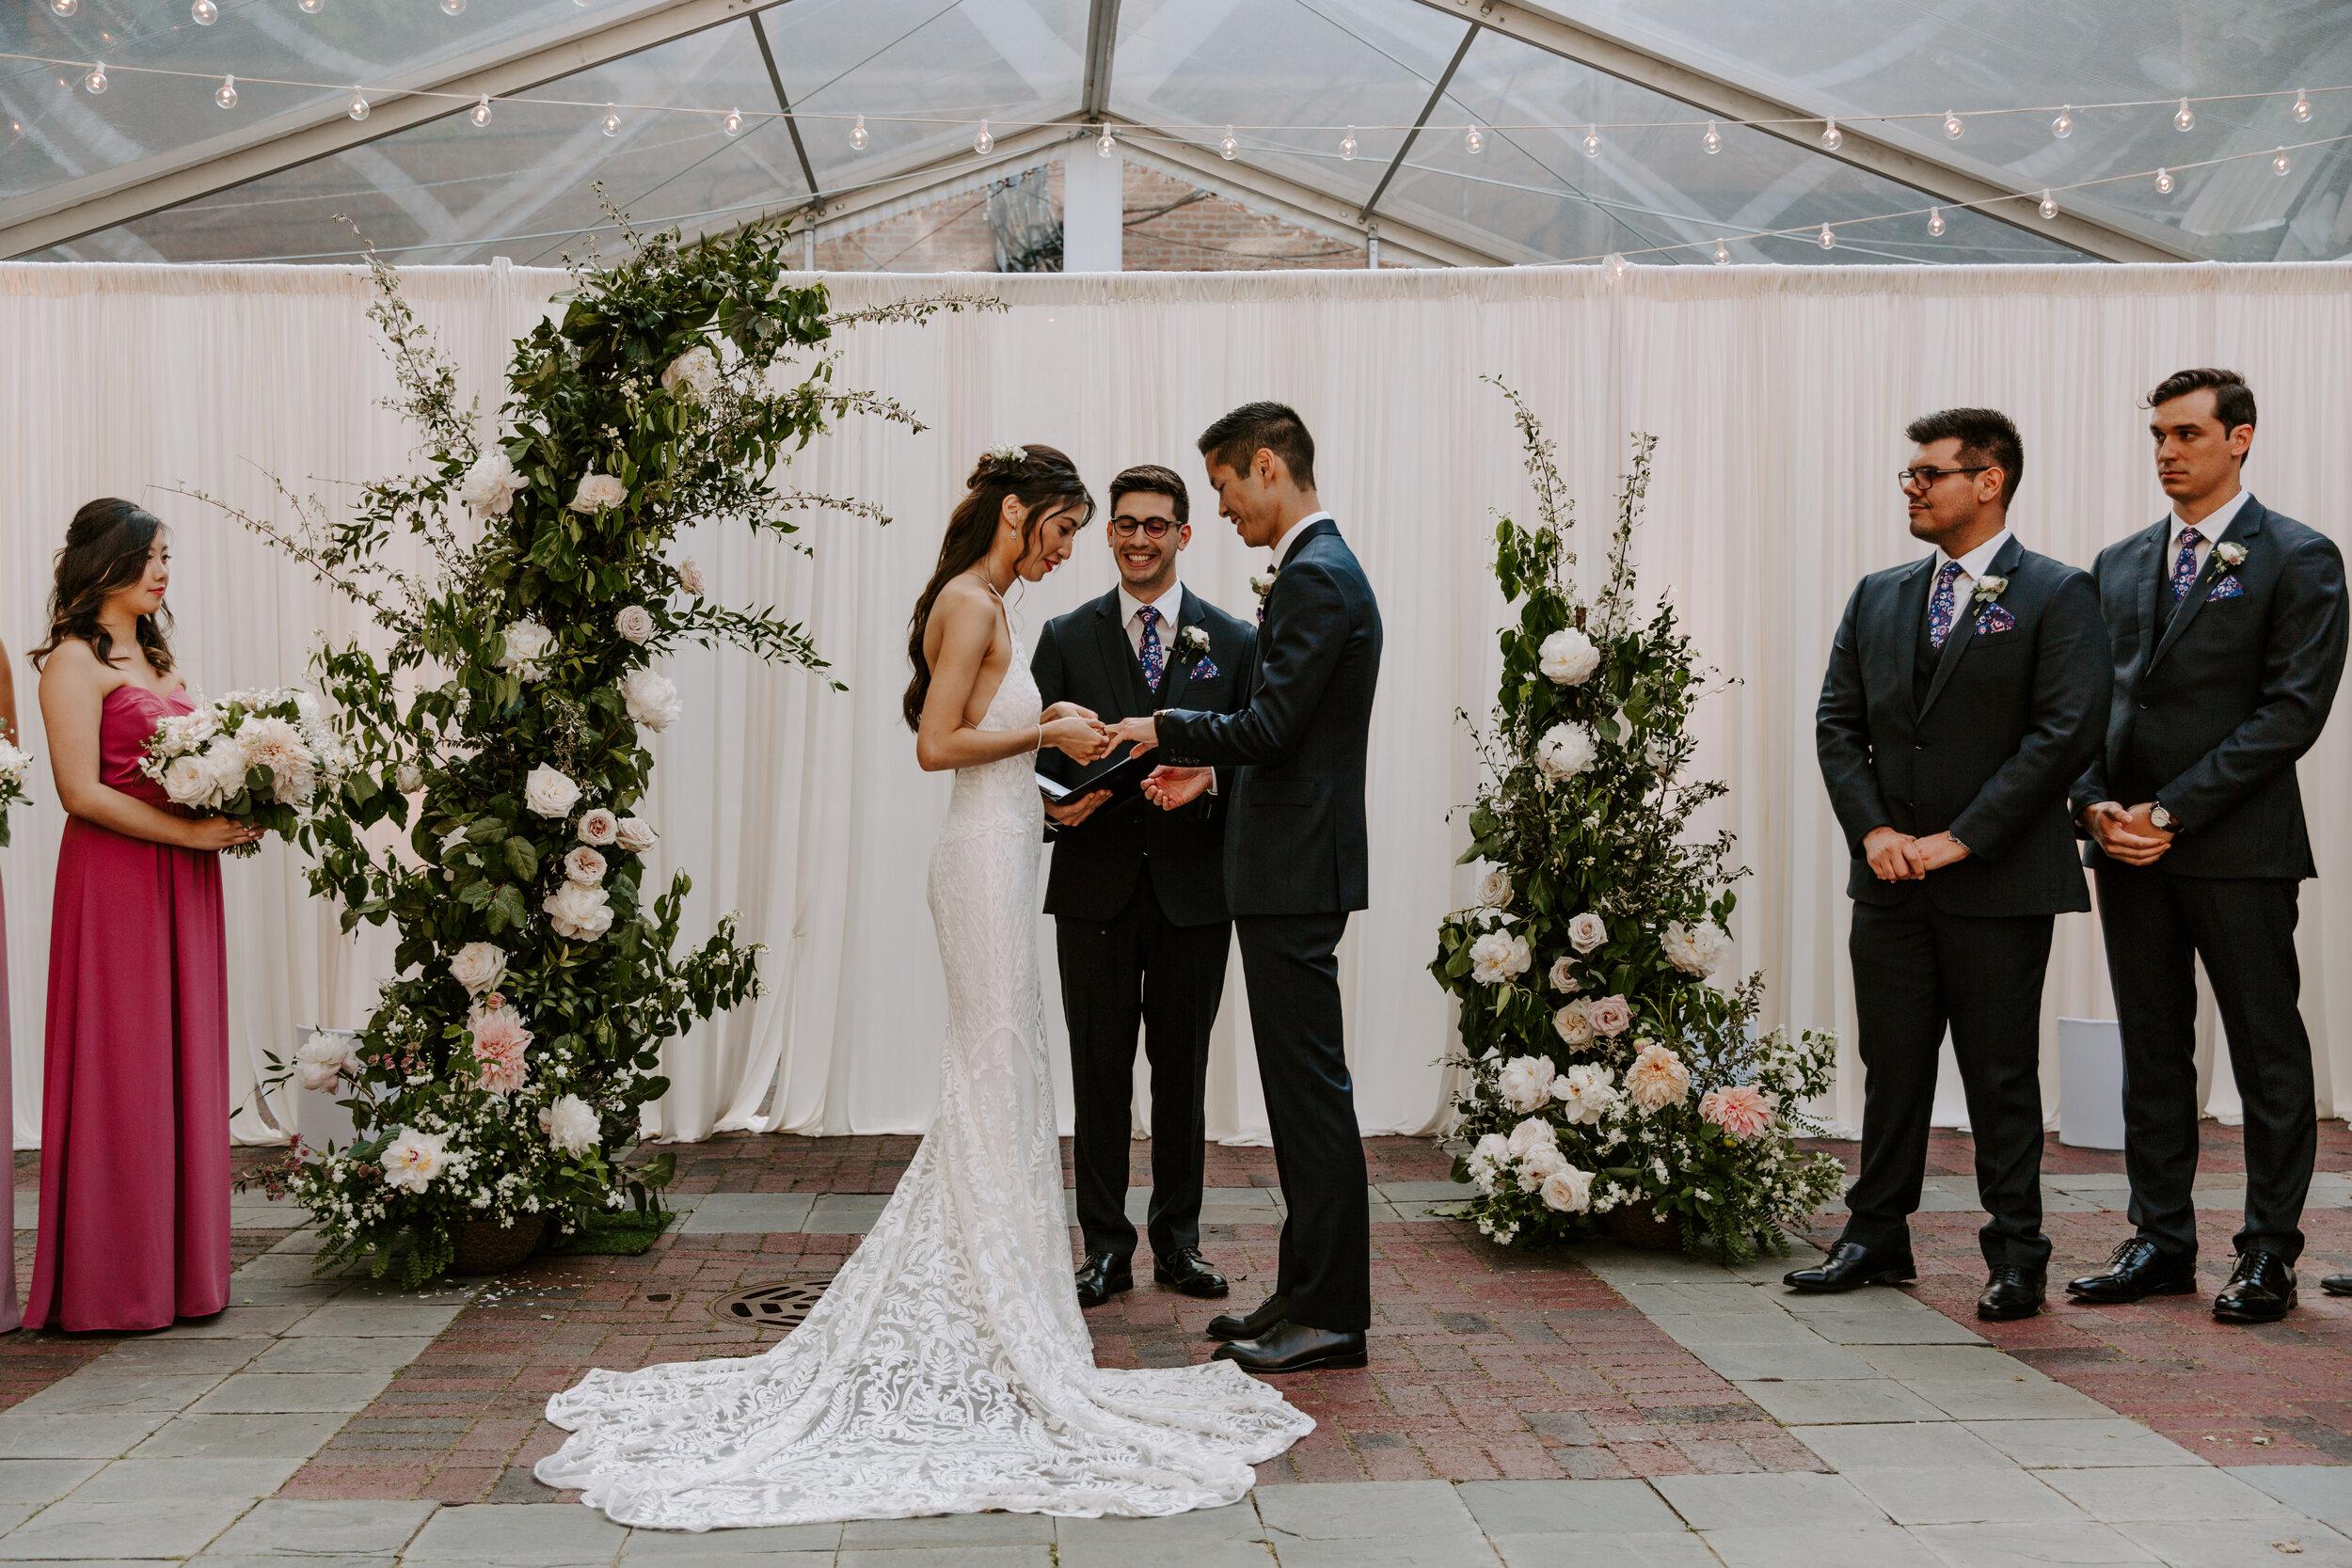 quan wedding-245.jpg